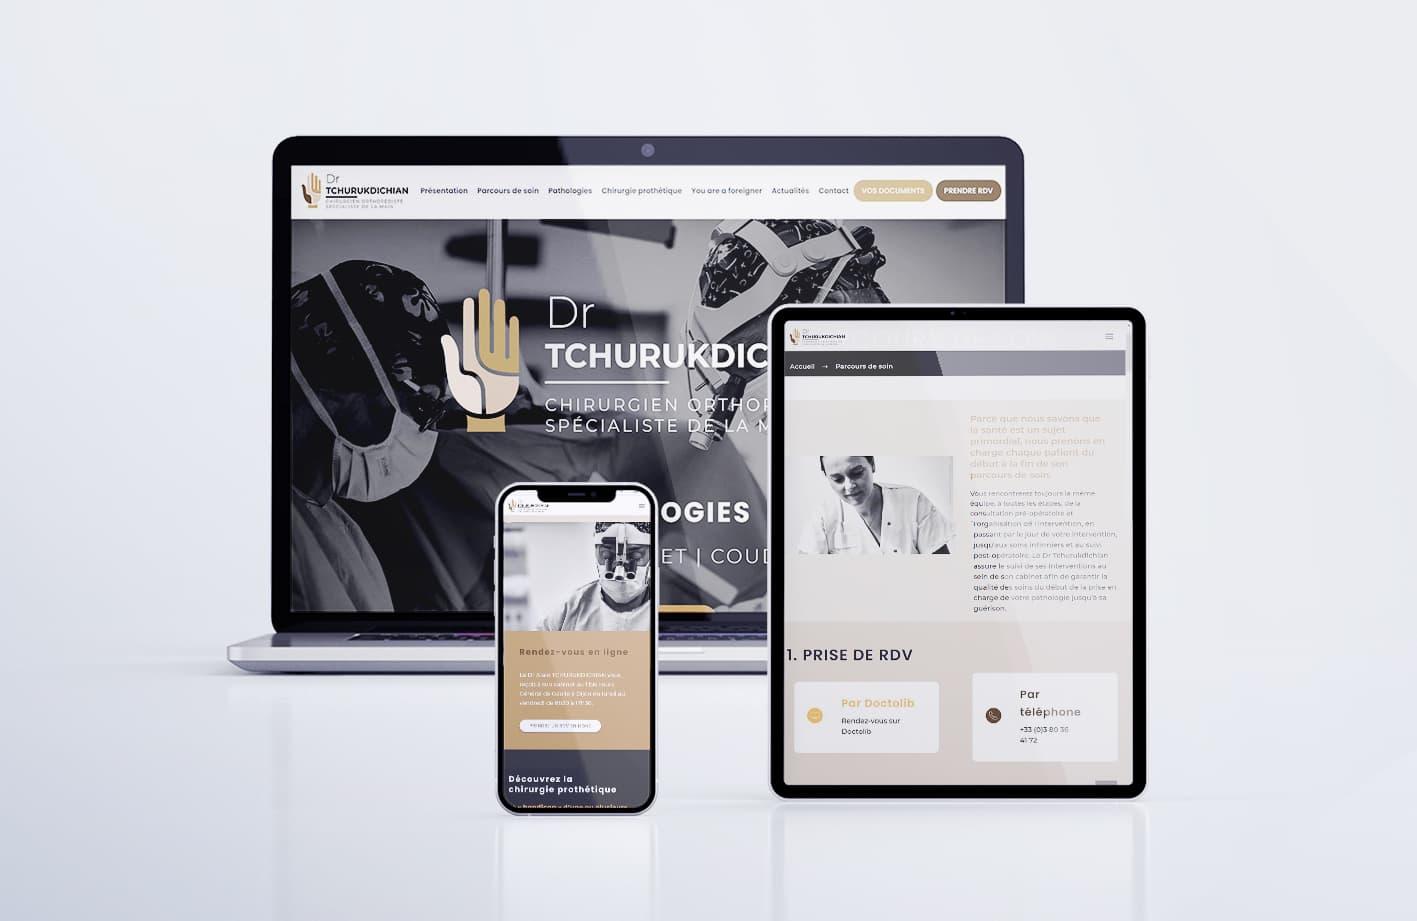 eclolink_agence_webmarketing_client_dijon_mockup-site-dr-Tchurukdichian